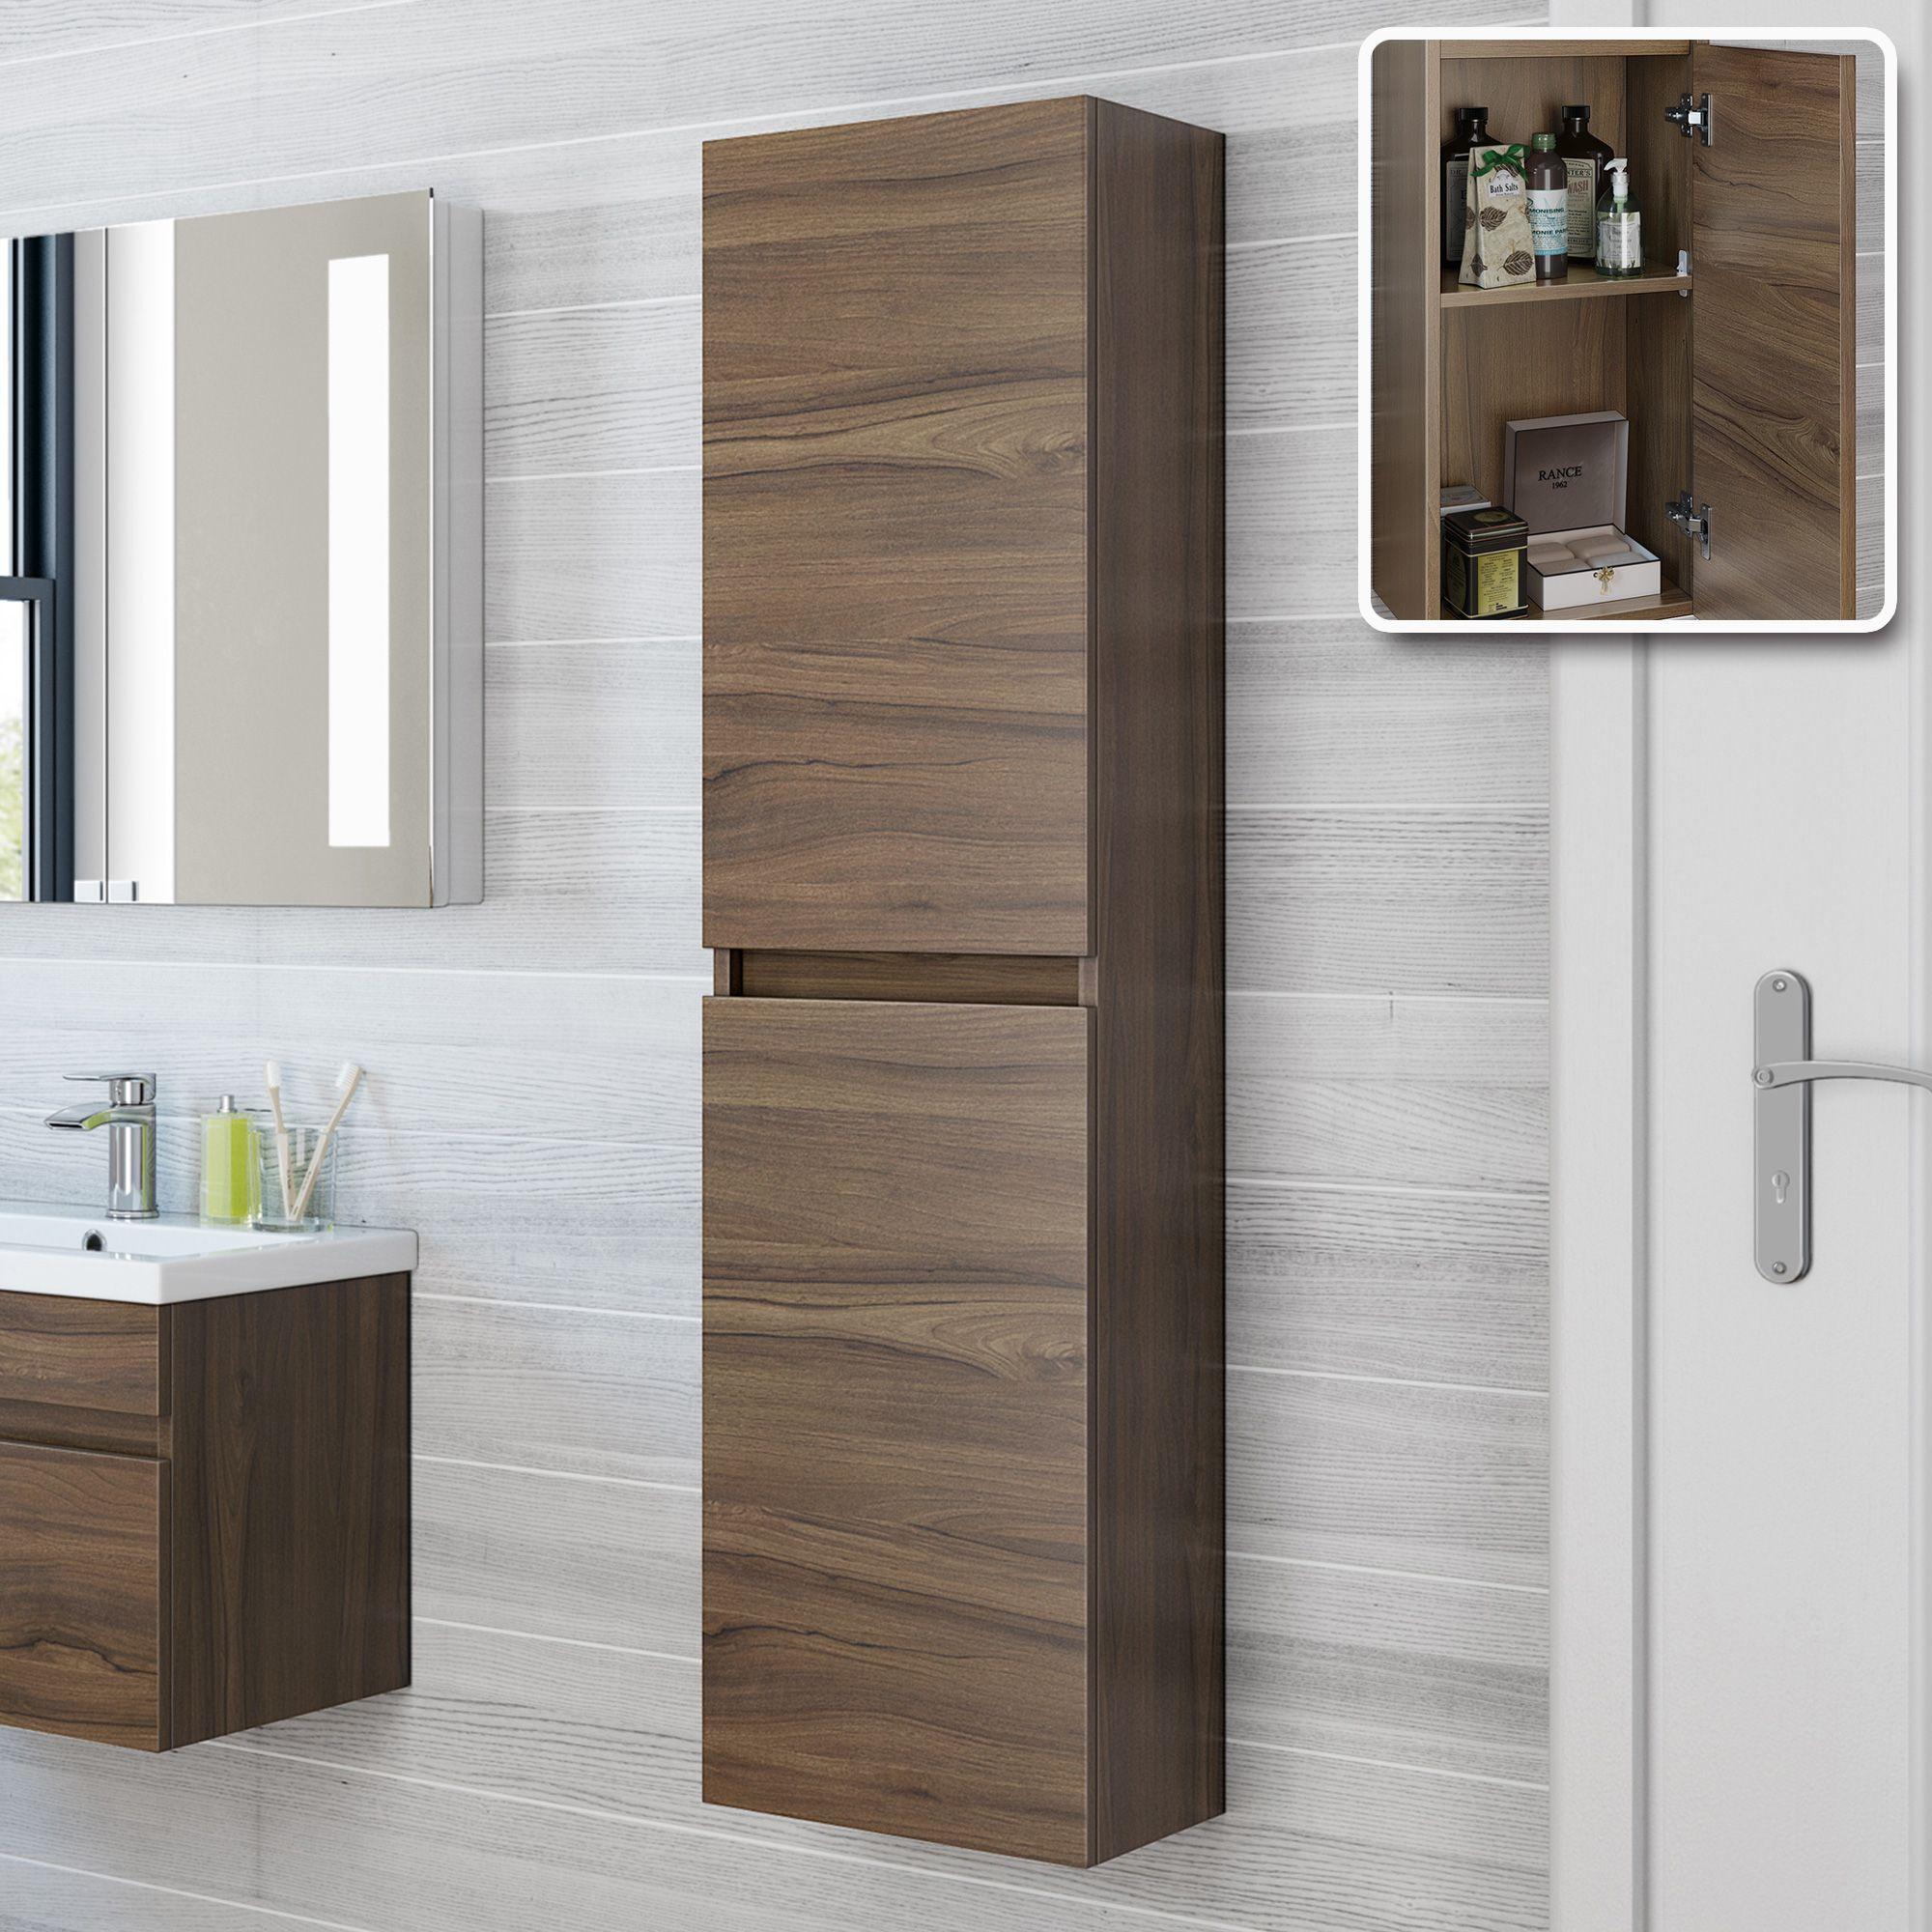 1400mm Walnut Tall Wall Mounted Cabinet Trent Bathempire Tall Cabinet Storage Bathroom Wall Units Bathroom Storage Cabinet